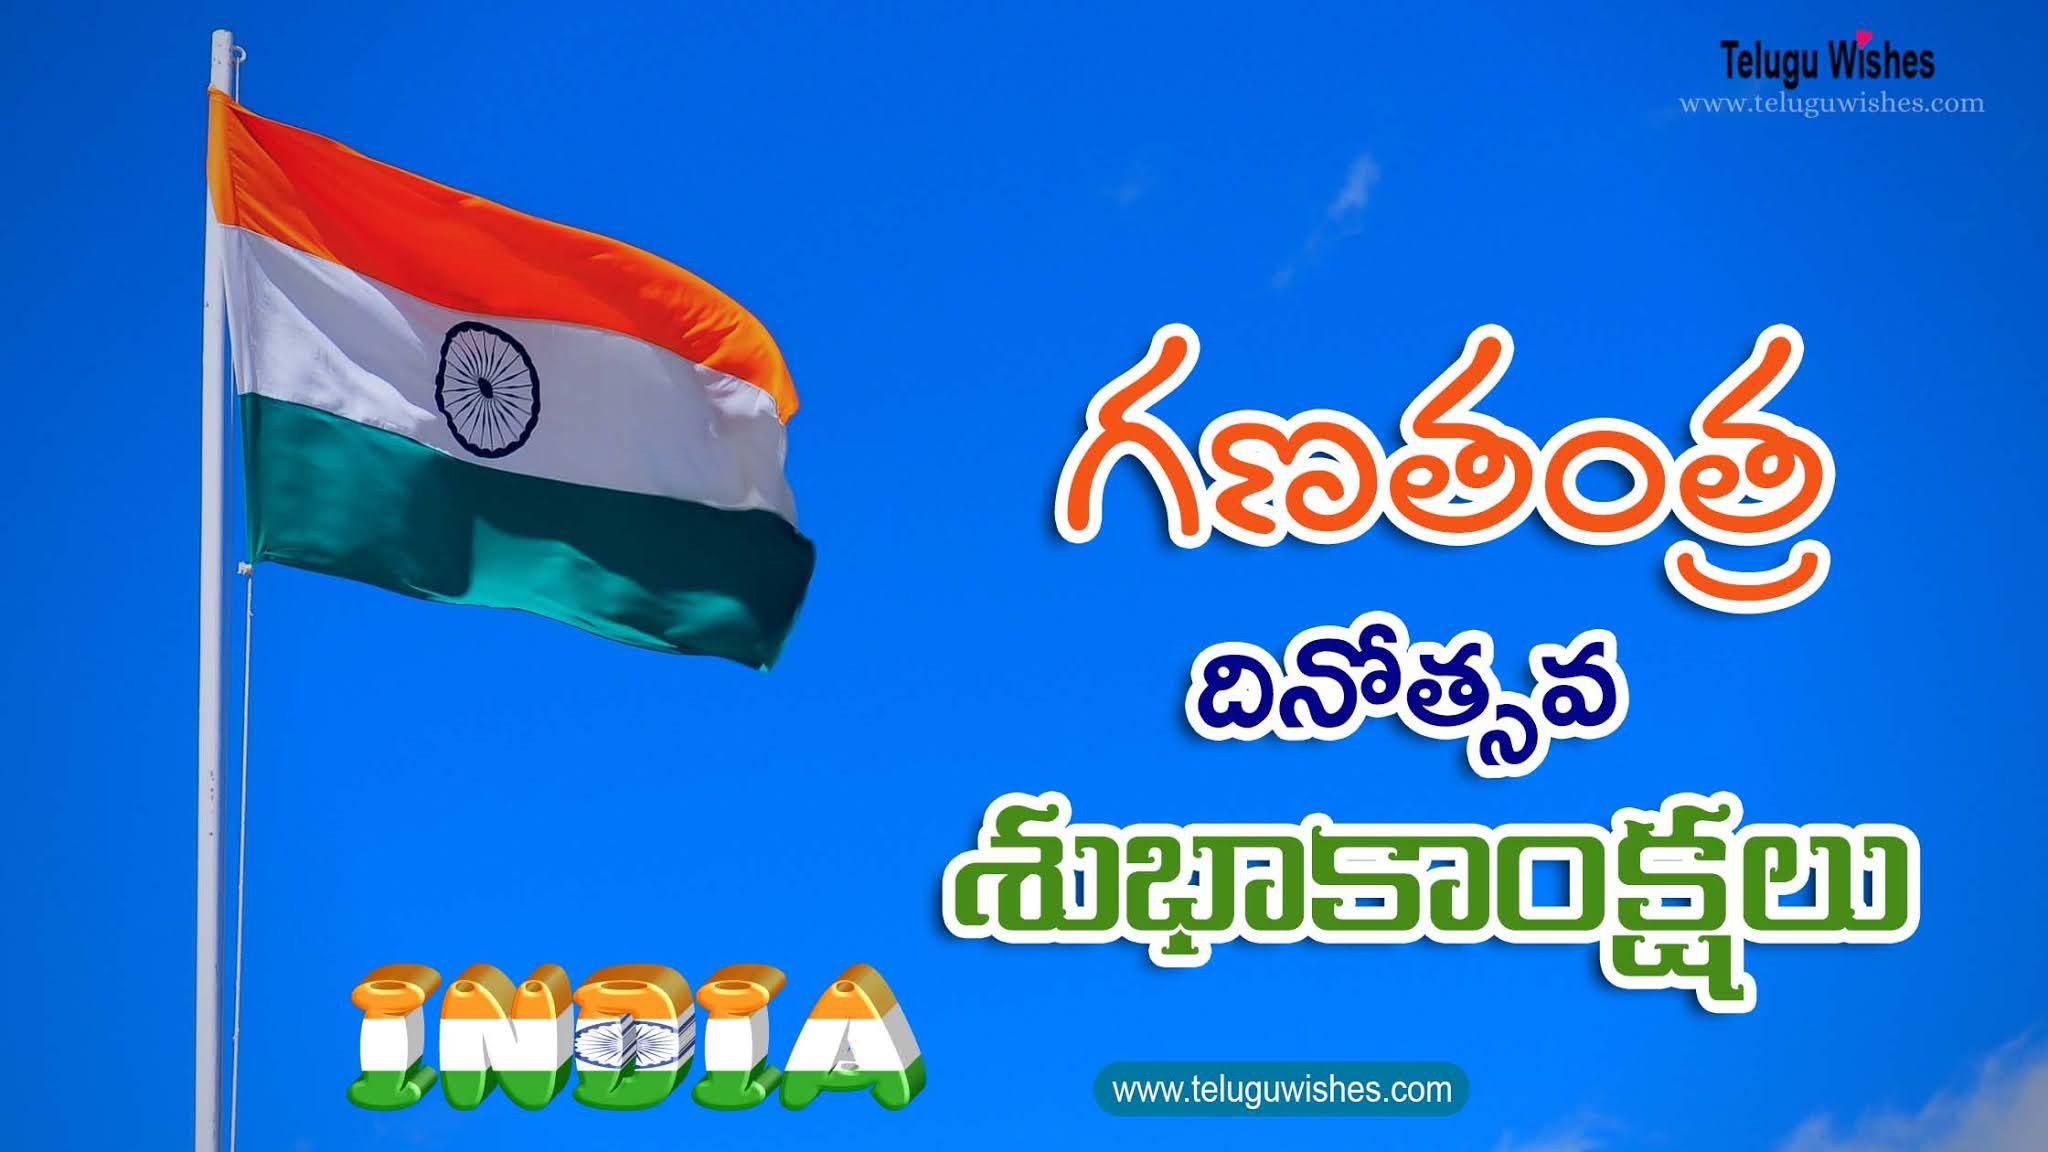 republic day greetings in telugu